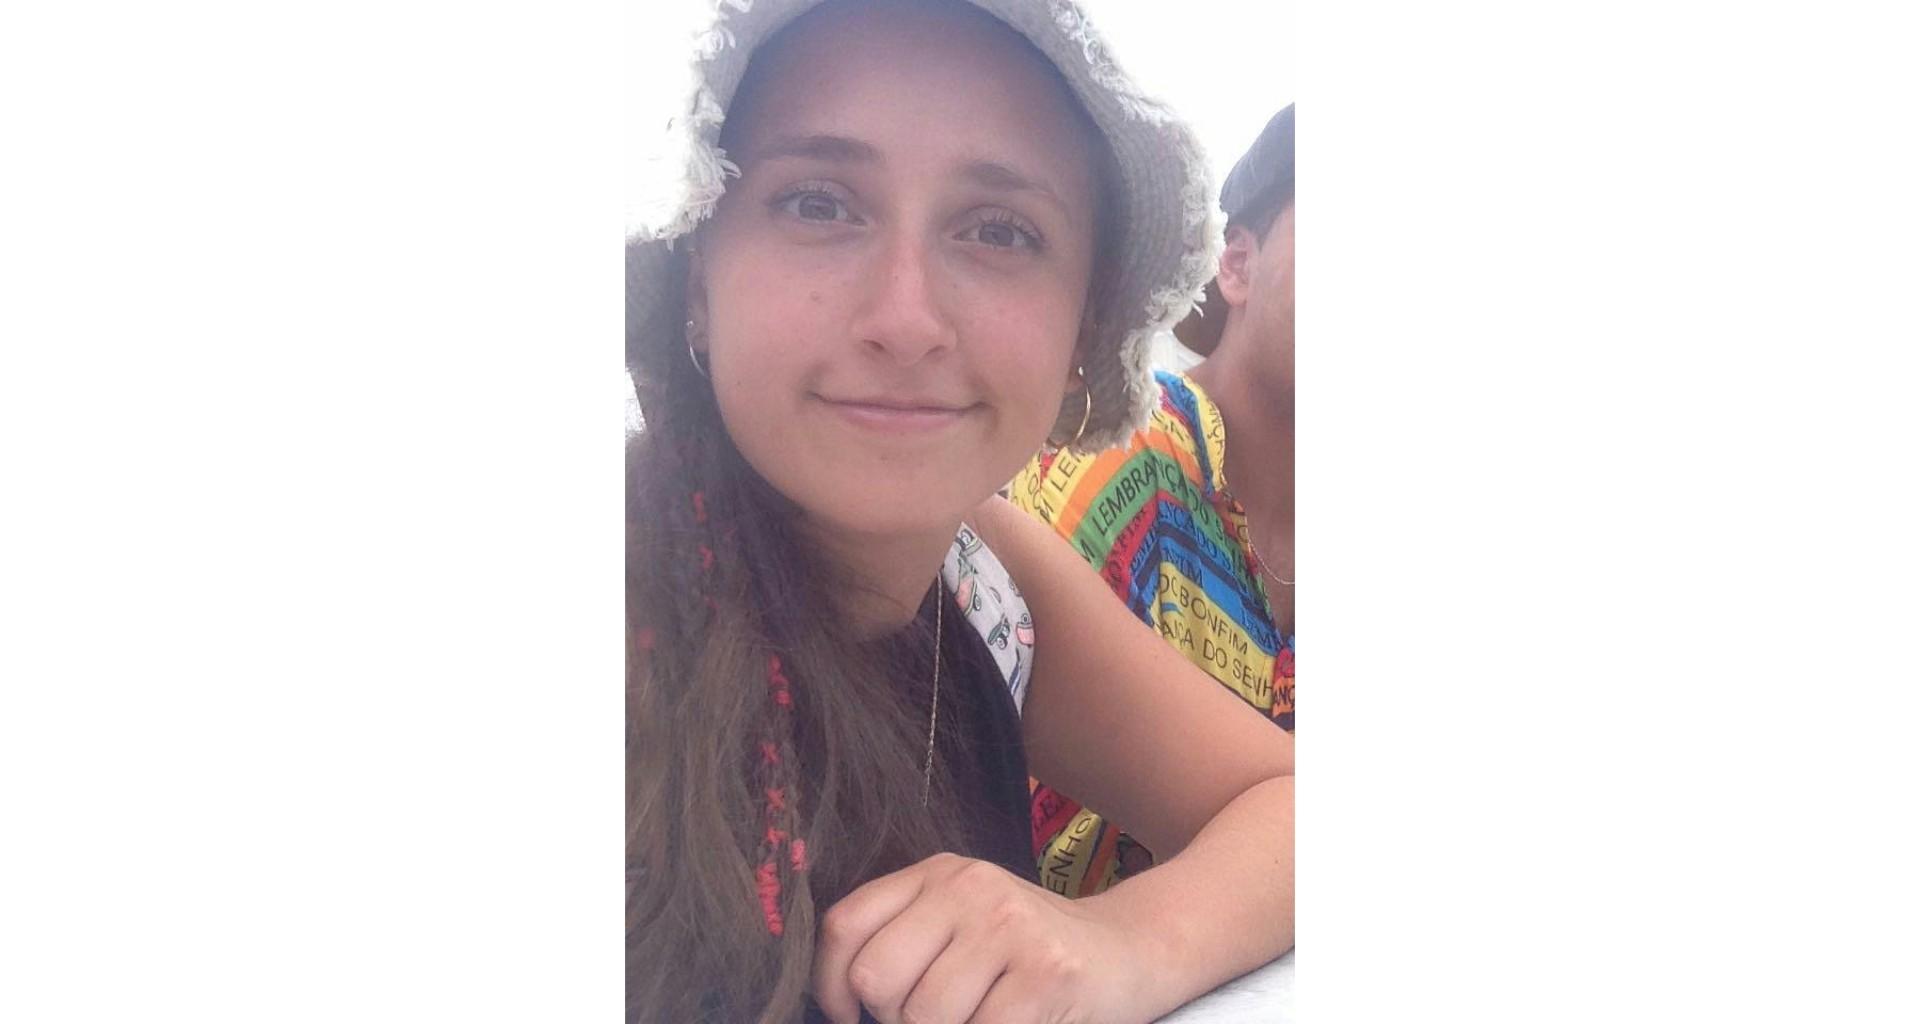 Apareció la joven mendocina buscada en Viña del Mar